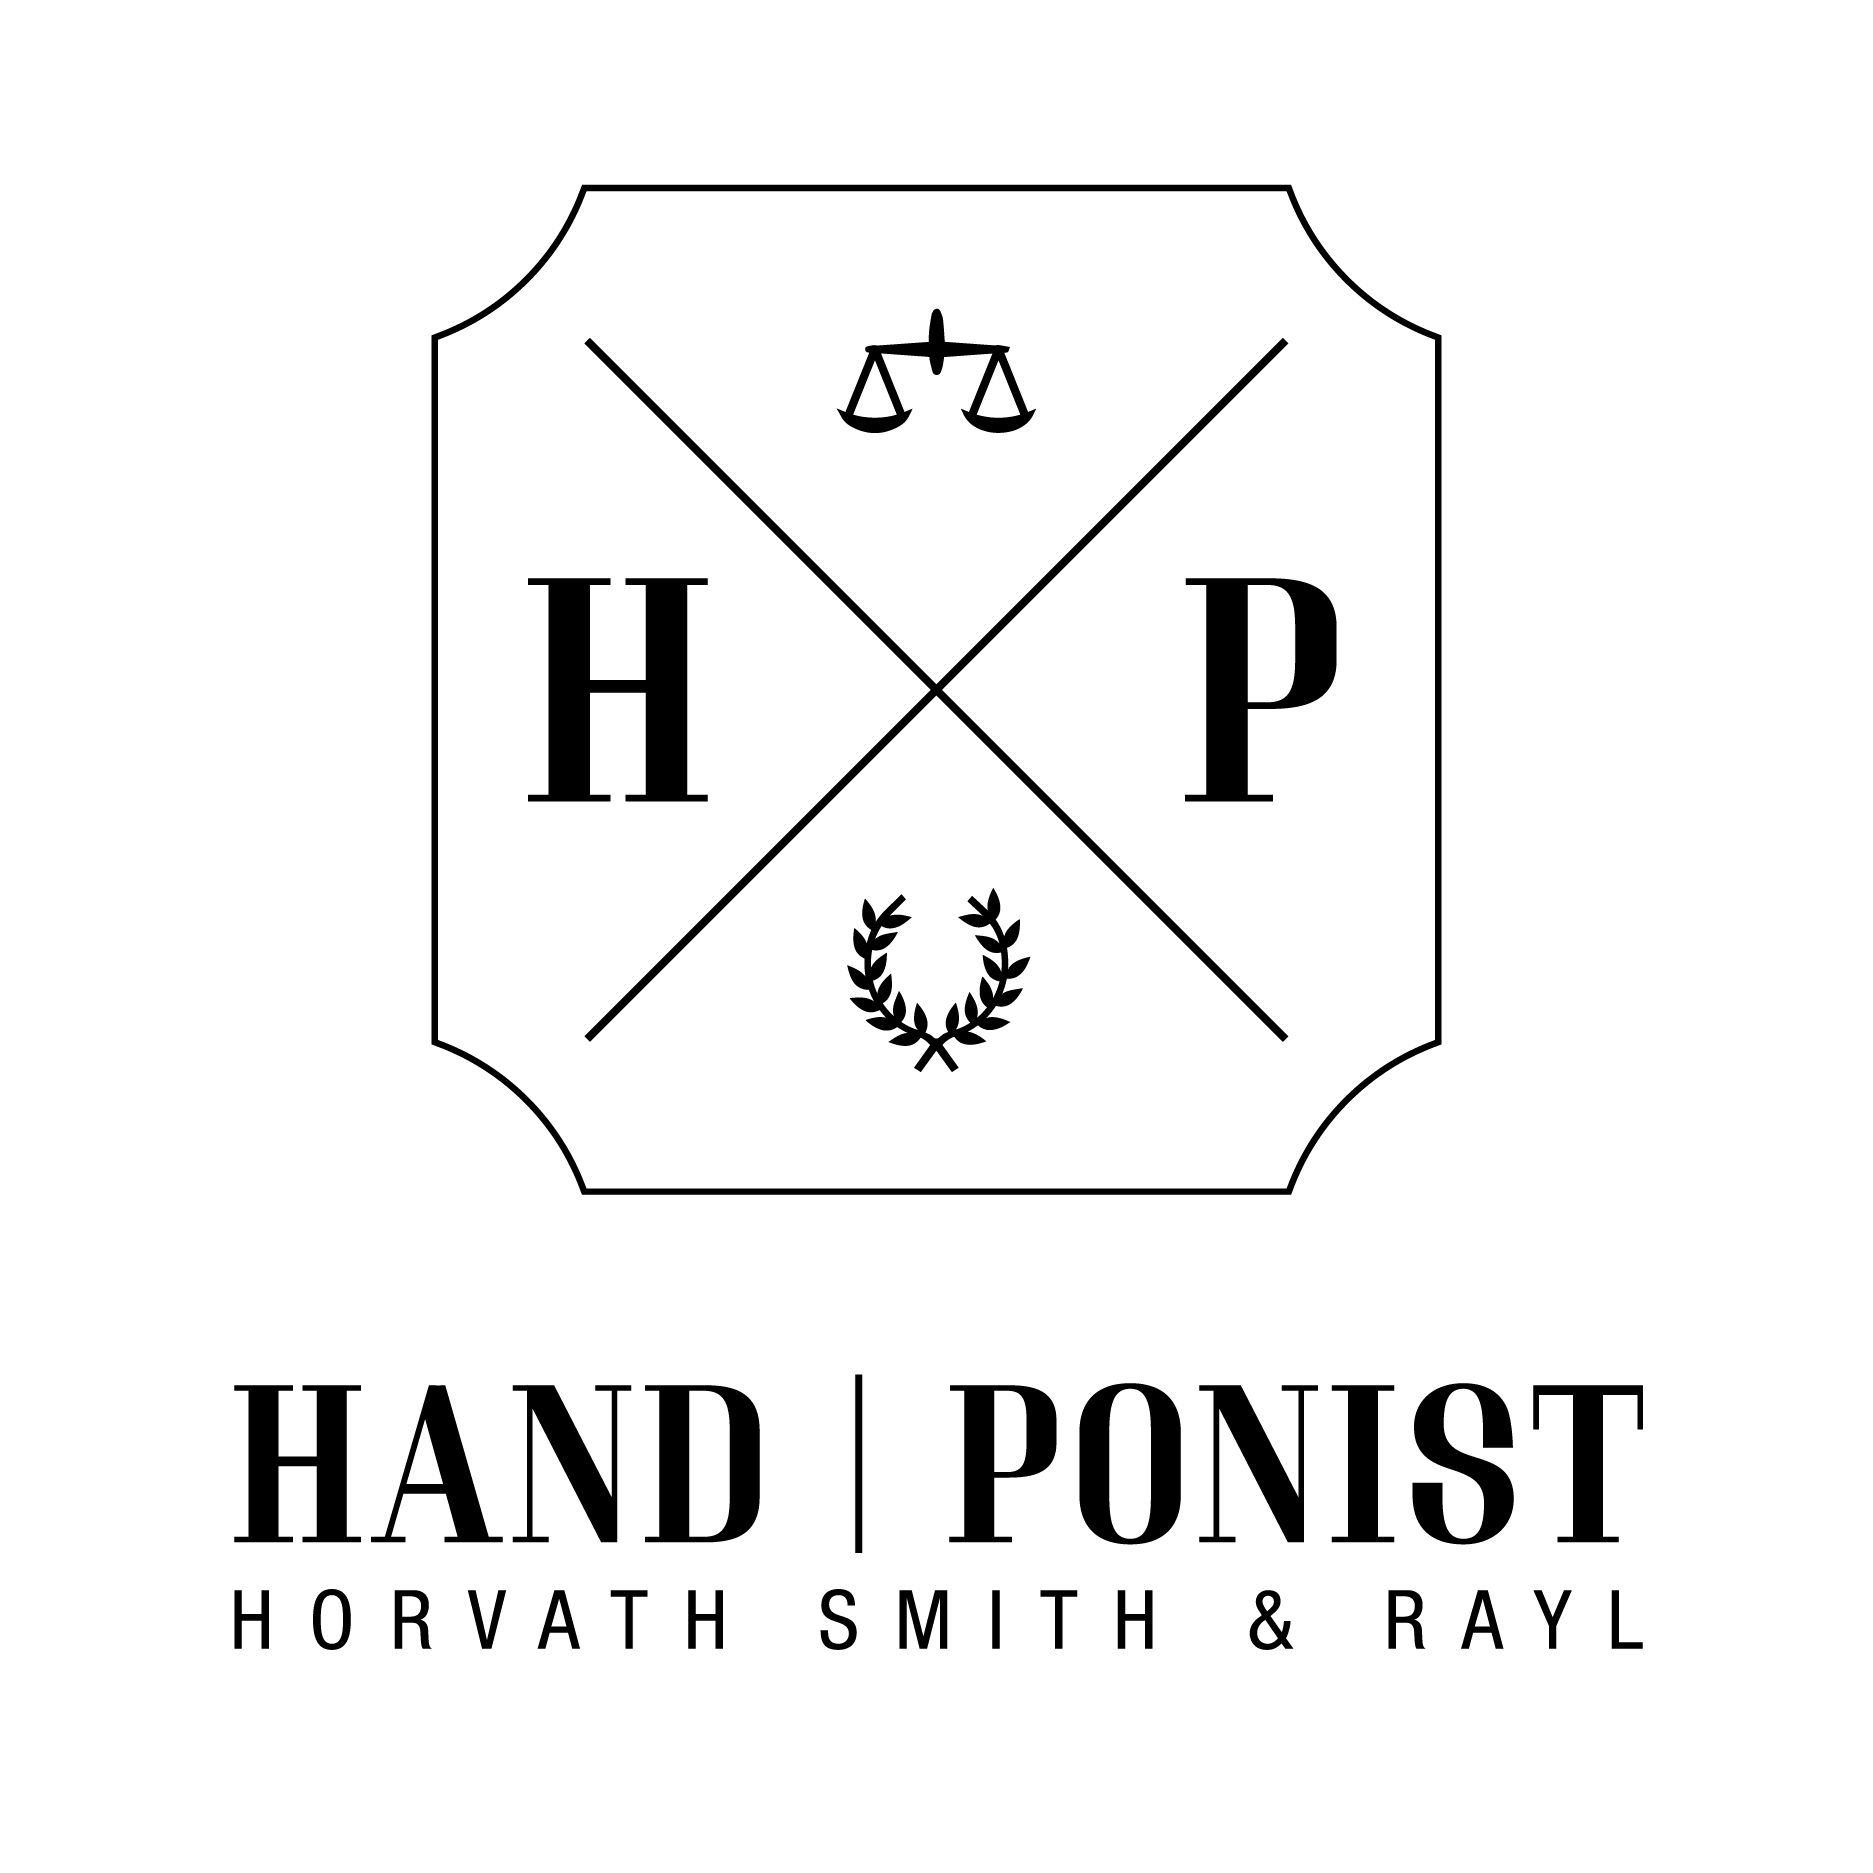 Hand Ponist Horvath Smith & Rayl, LLC